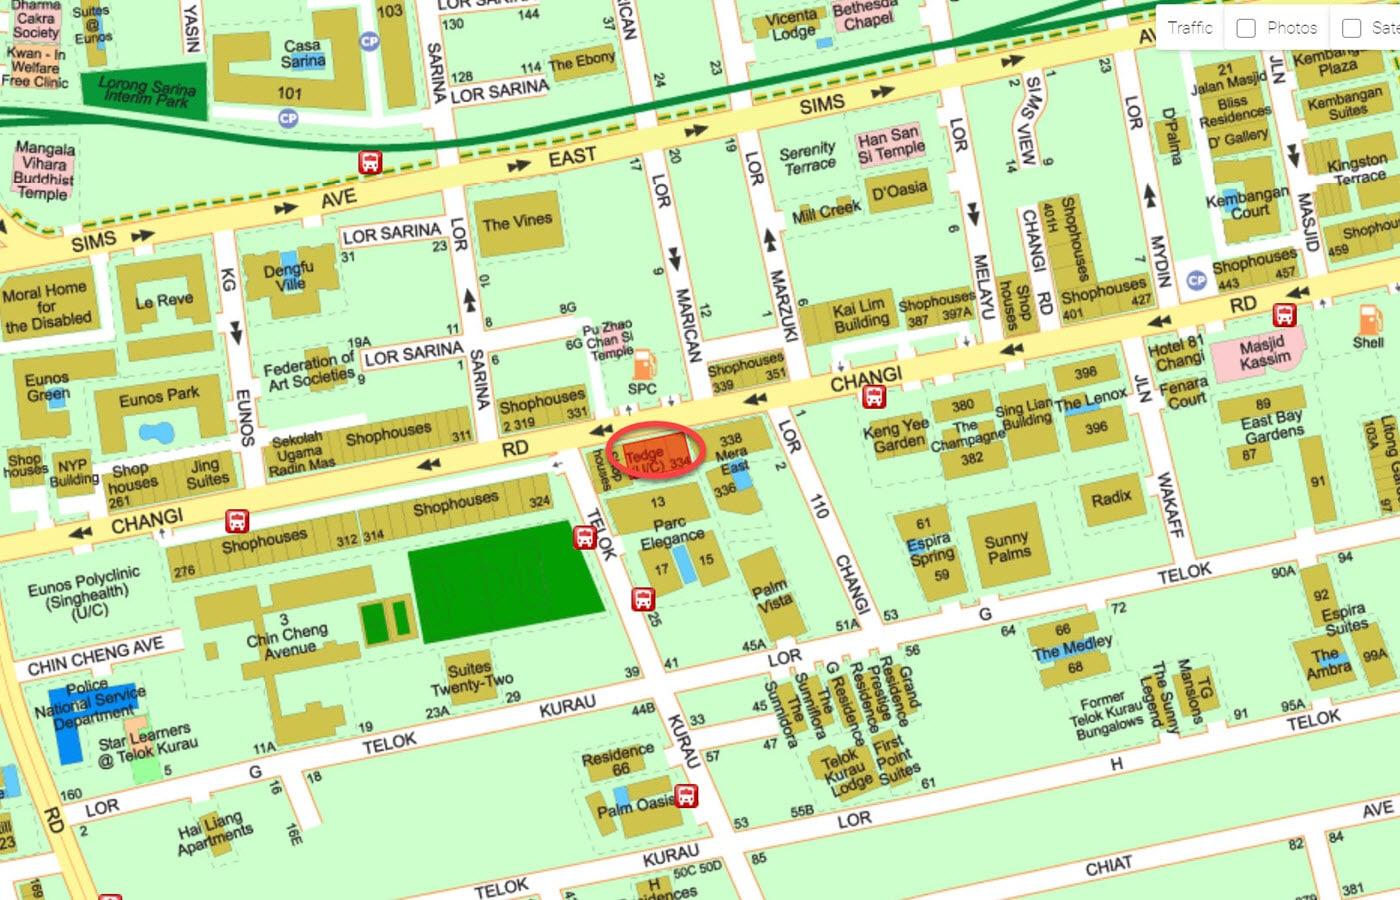 Tedge - Street Directory Map